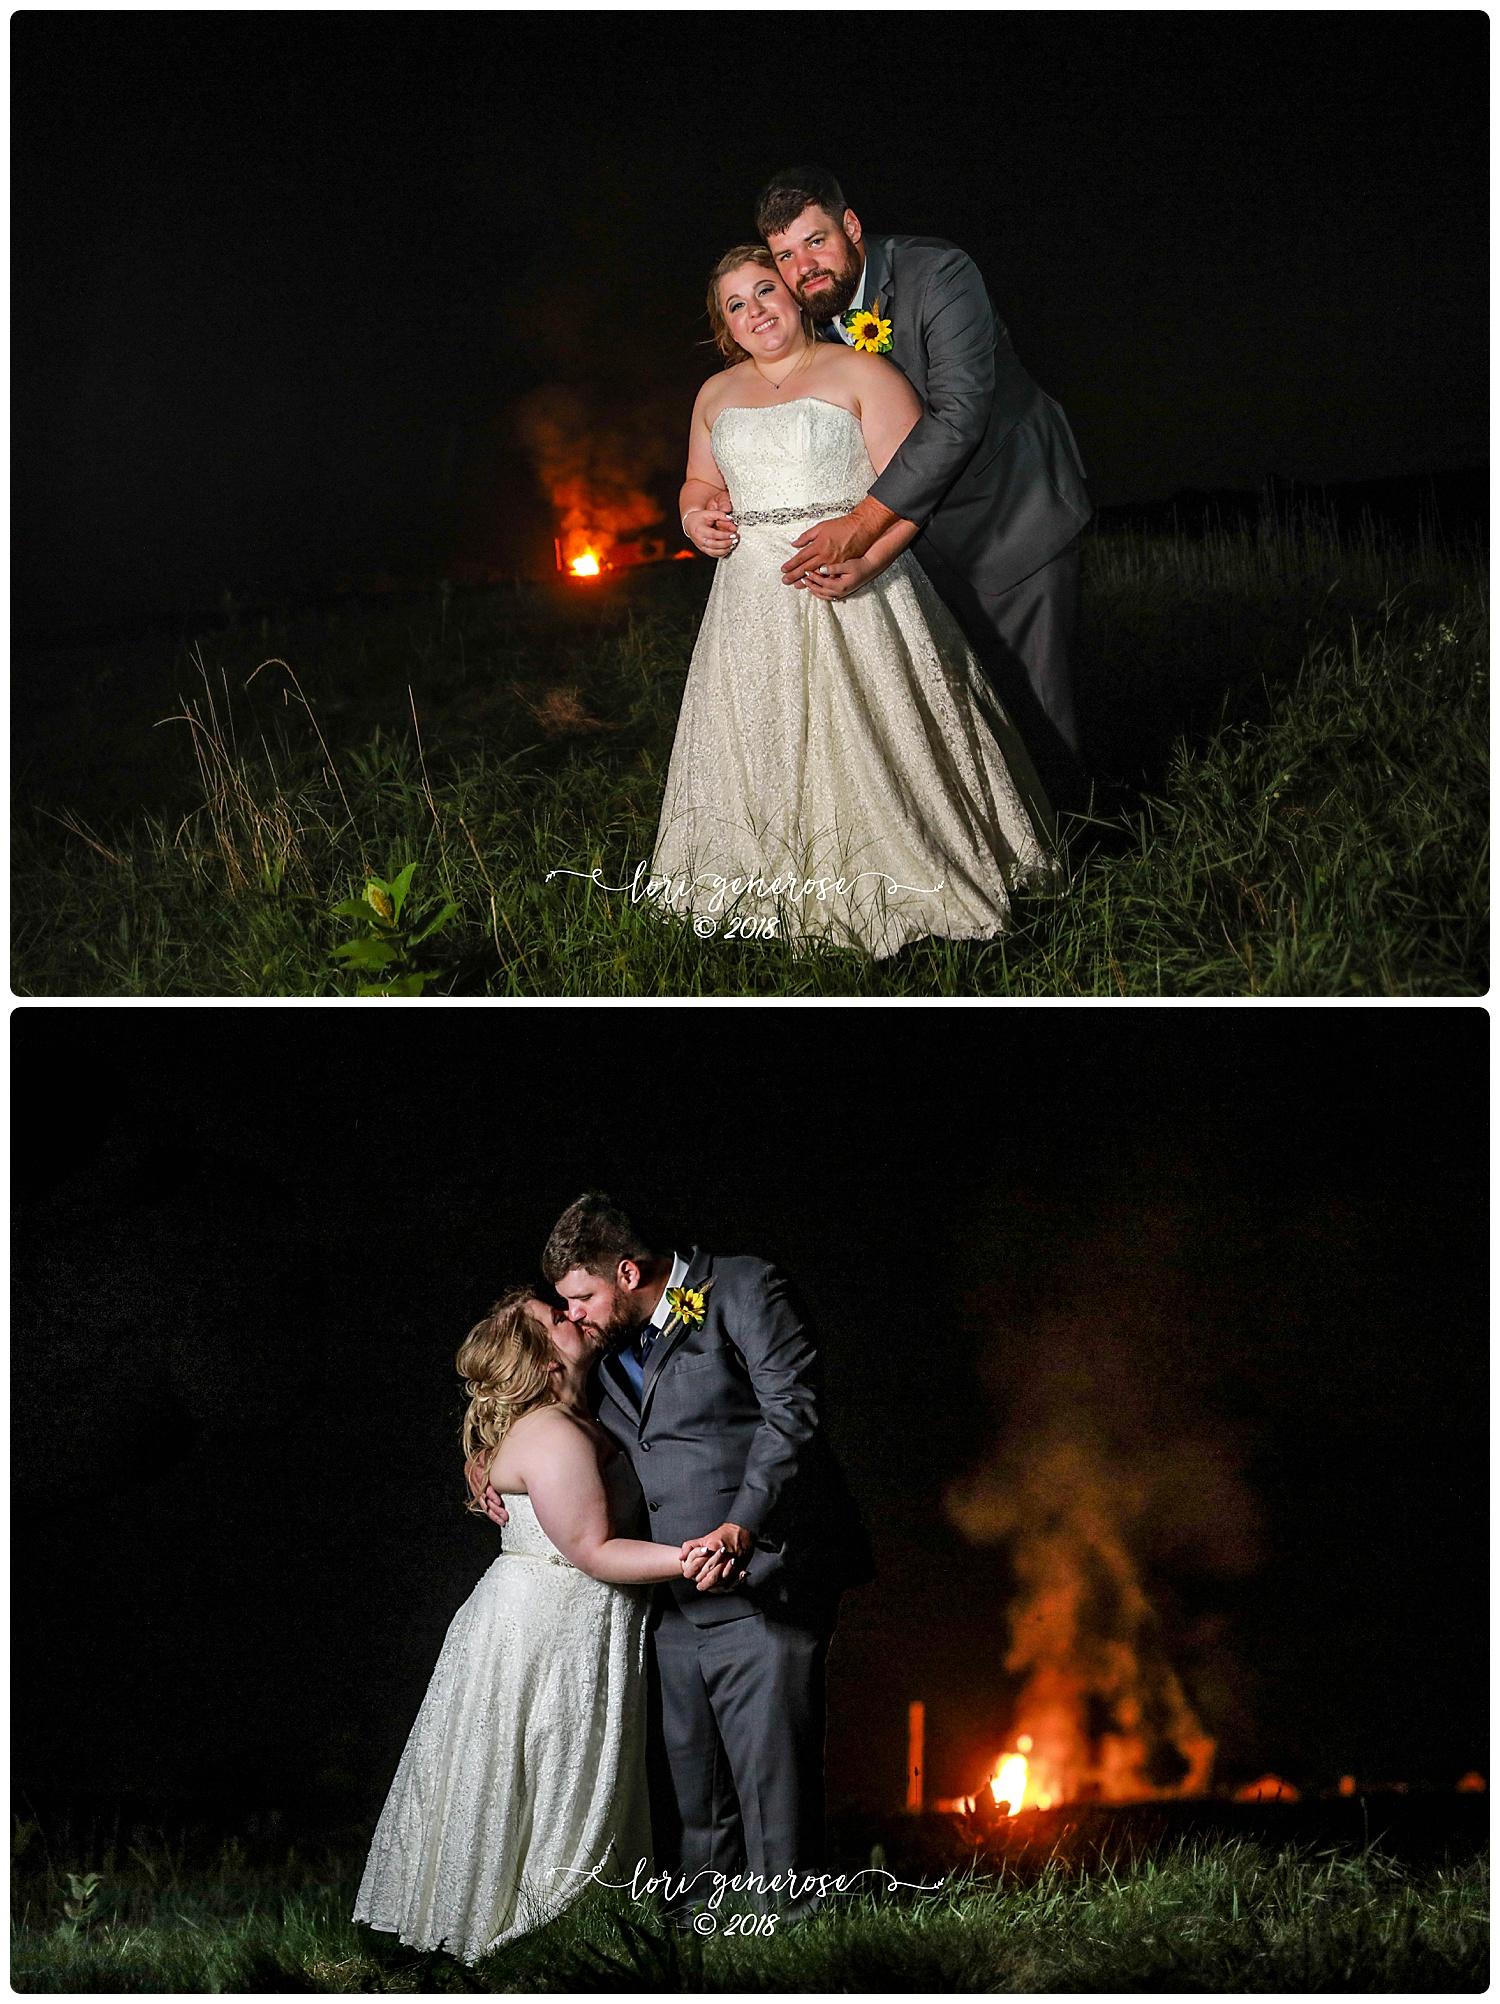 lgphotographylorigeneroseoldehomesteadnewtripoliweddingbrideandgroomformalsbonfirewedding.jpg